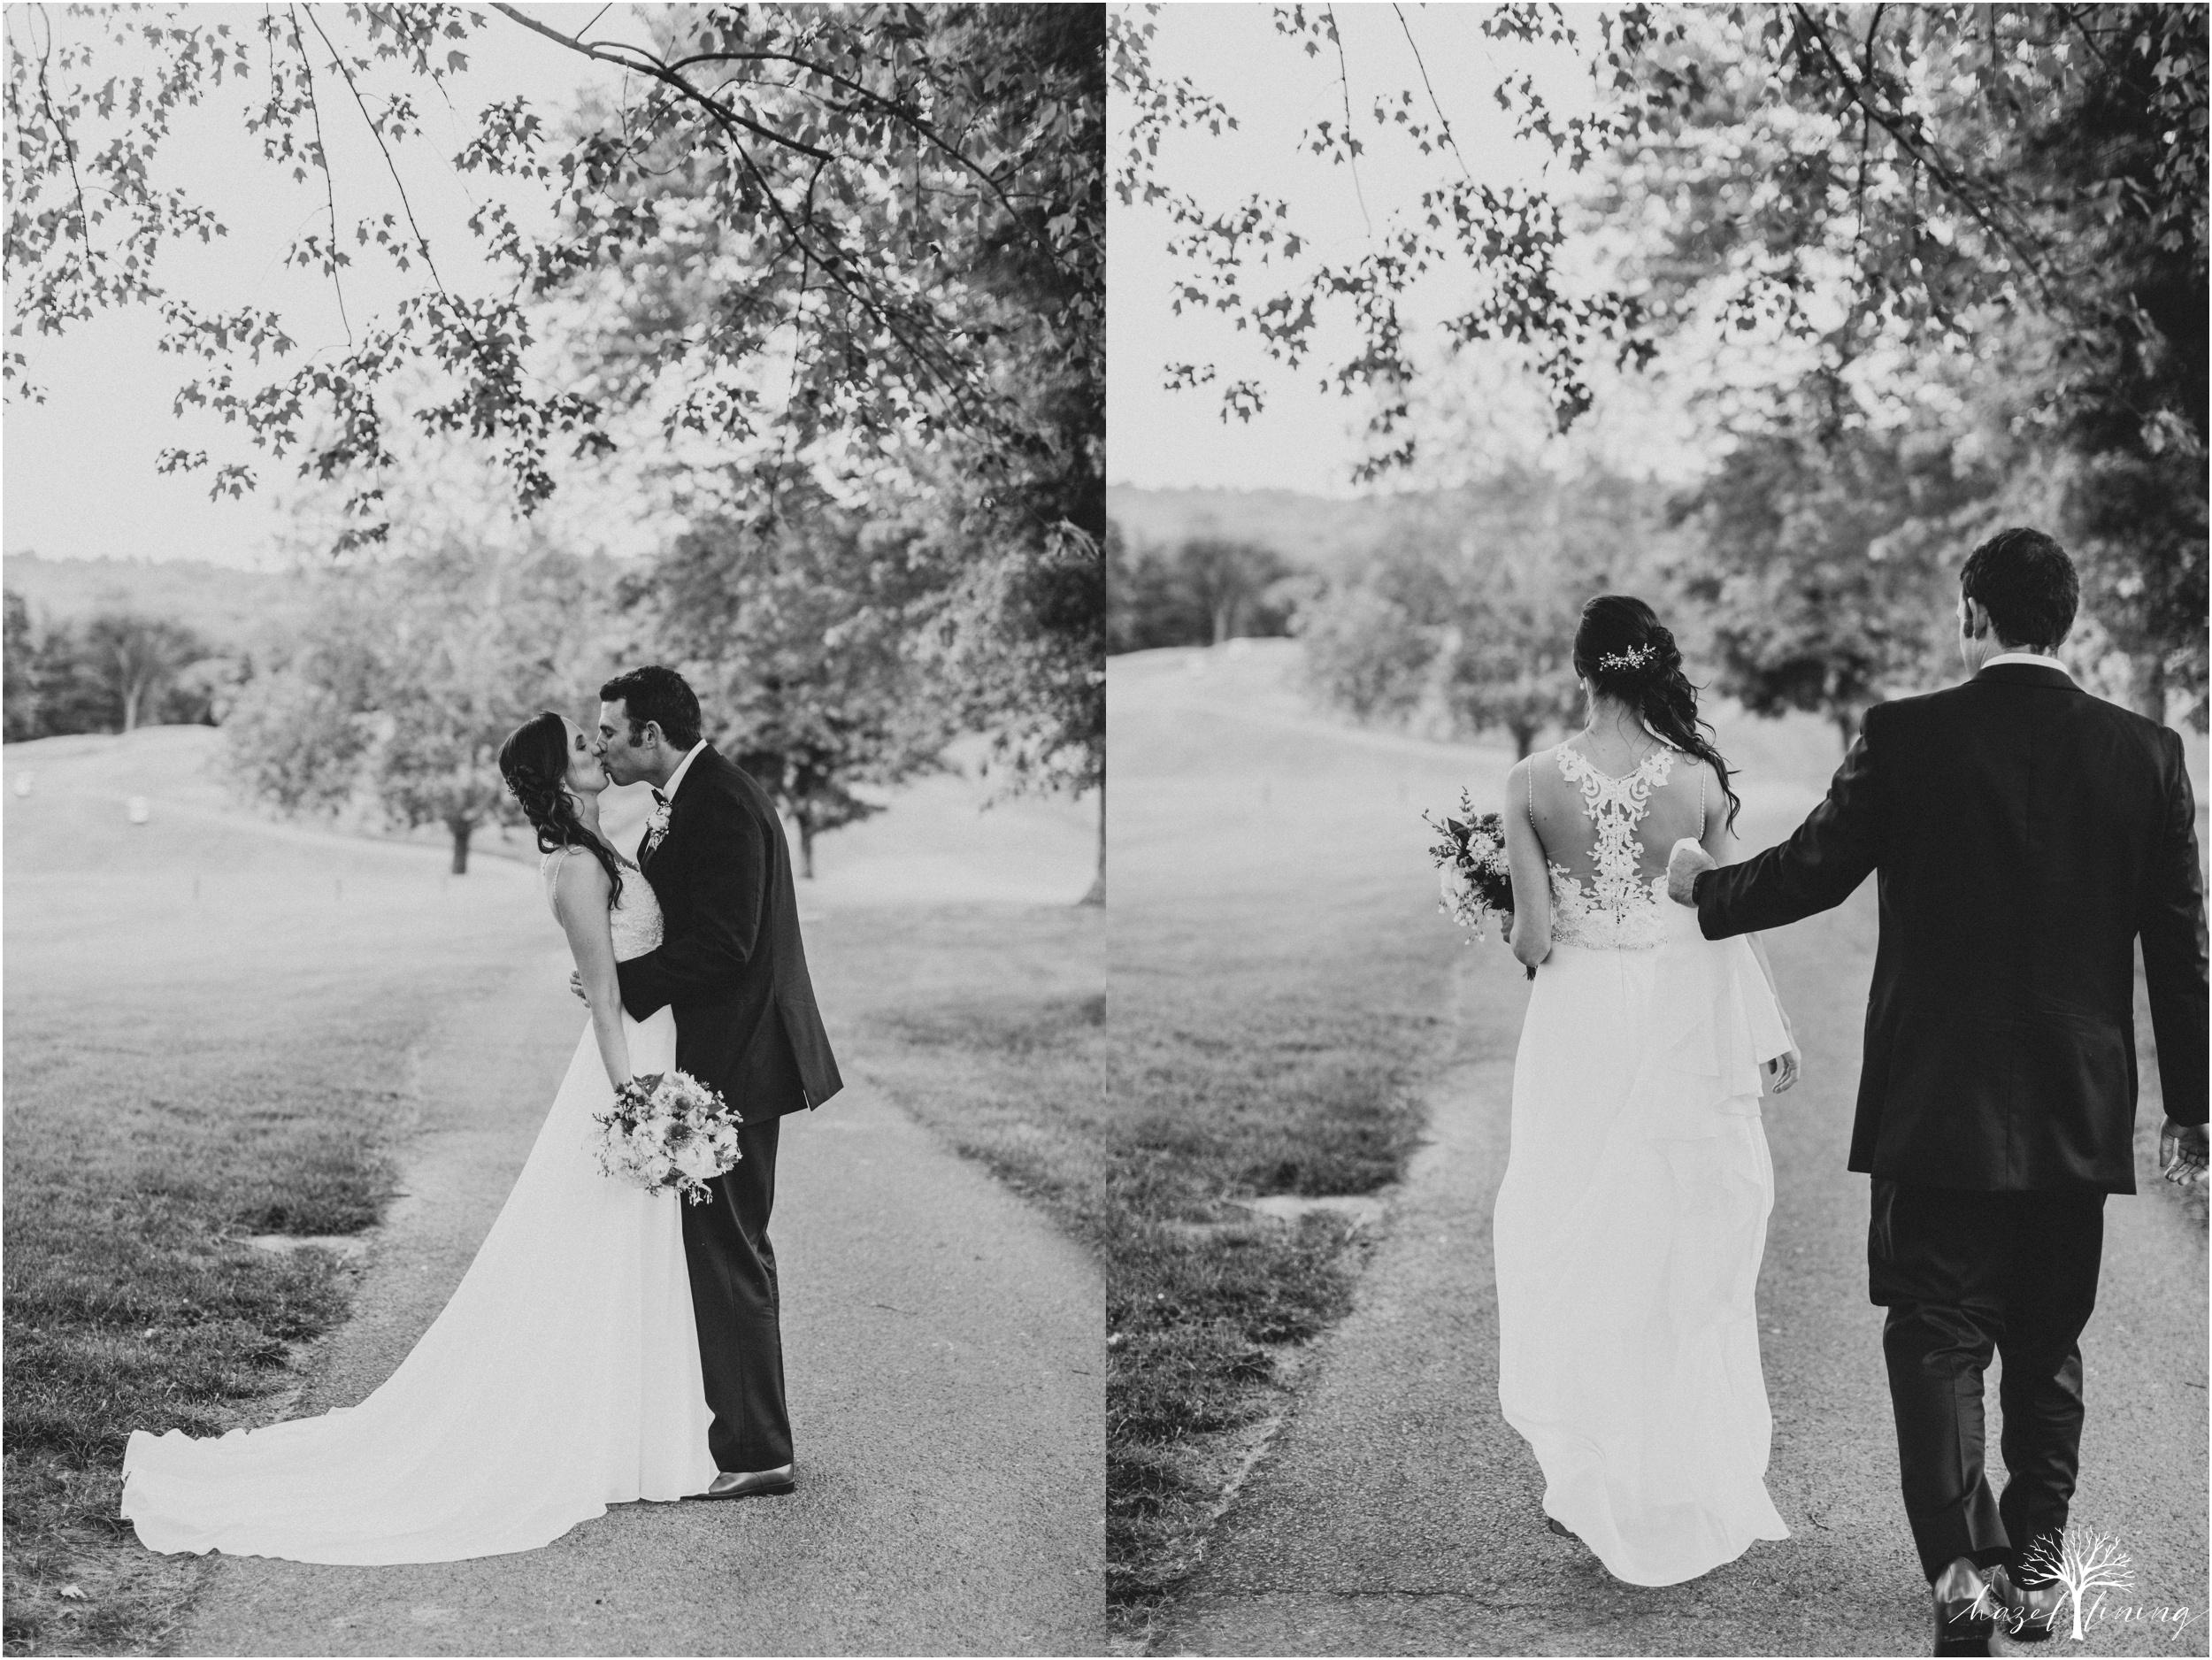 hazel-lining-travel-wedding-elopement-photography_0089.jpg